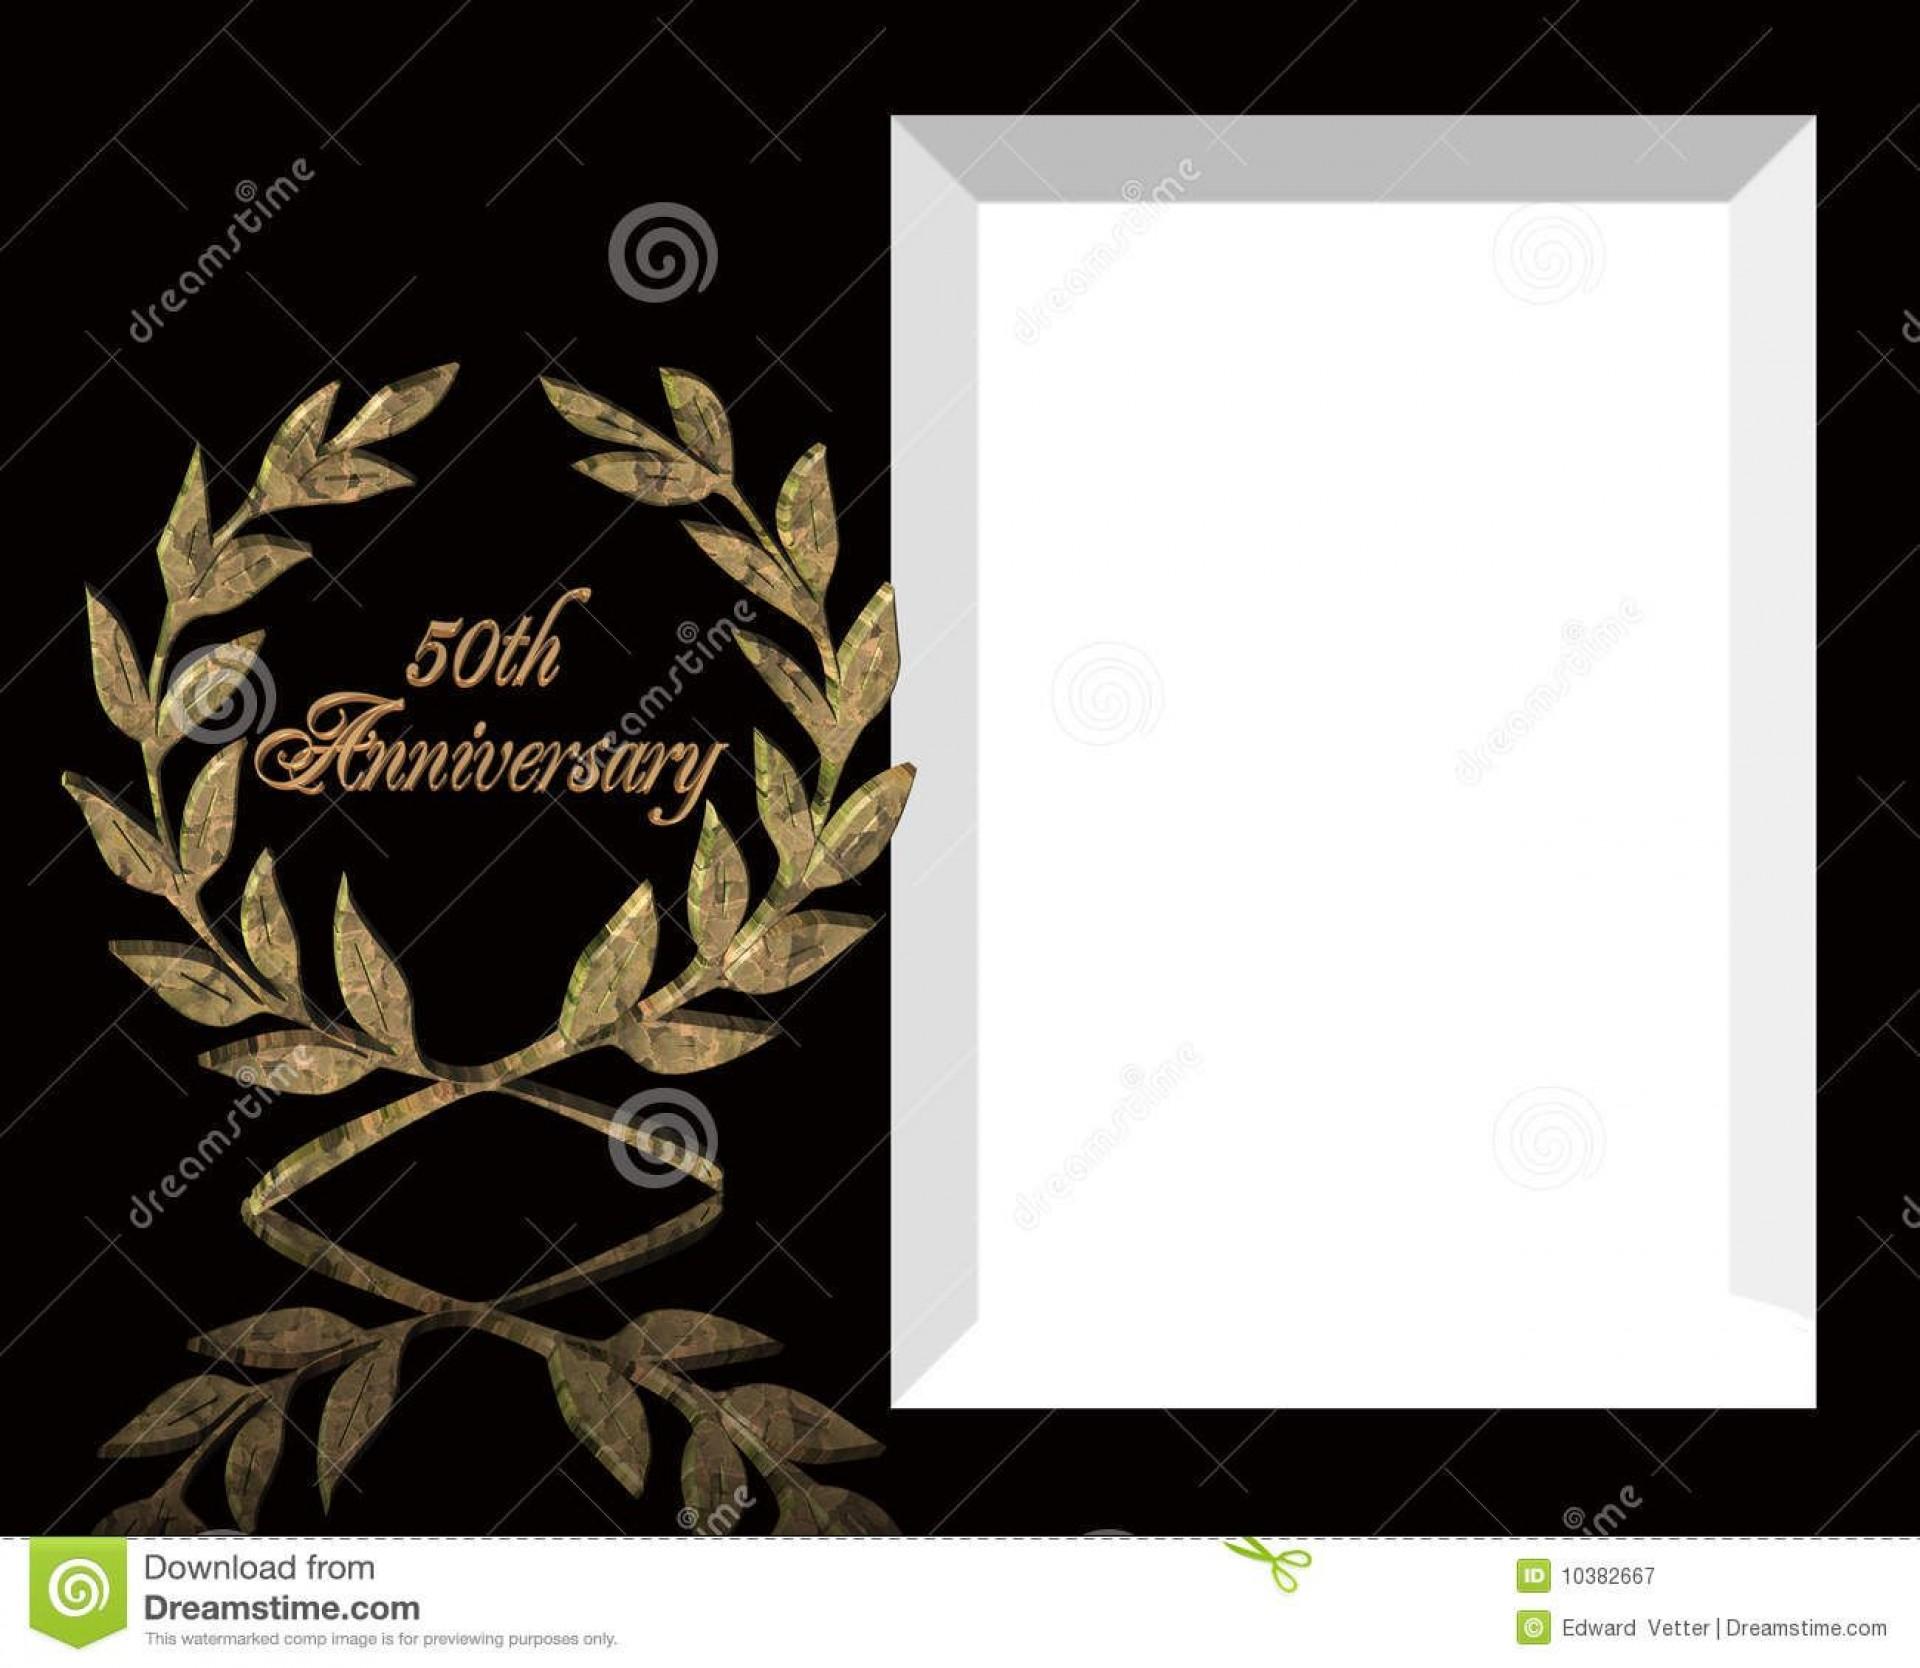 005 Surprising Golden Wedding Anniversary Invitation Template Free Inspiration  50th Microsoft Word Download1920